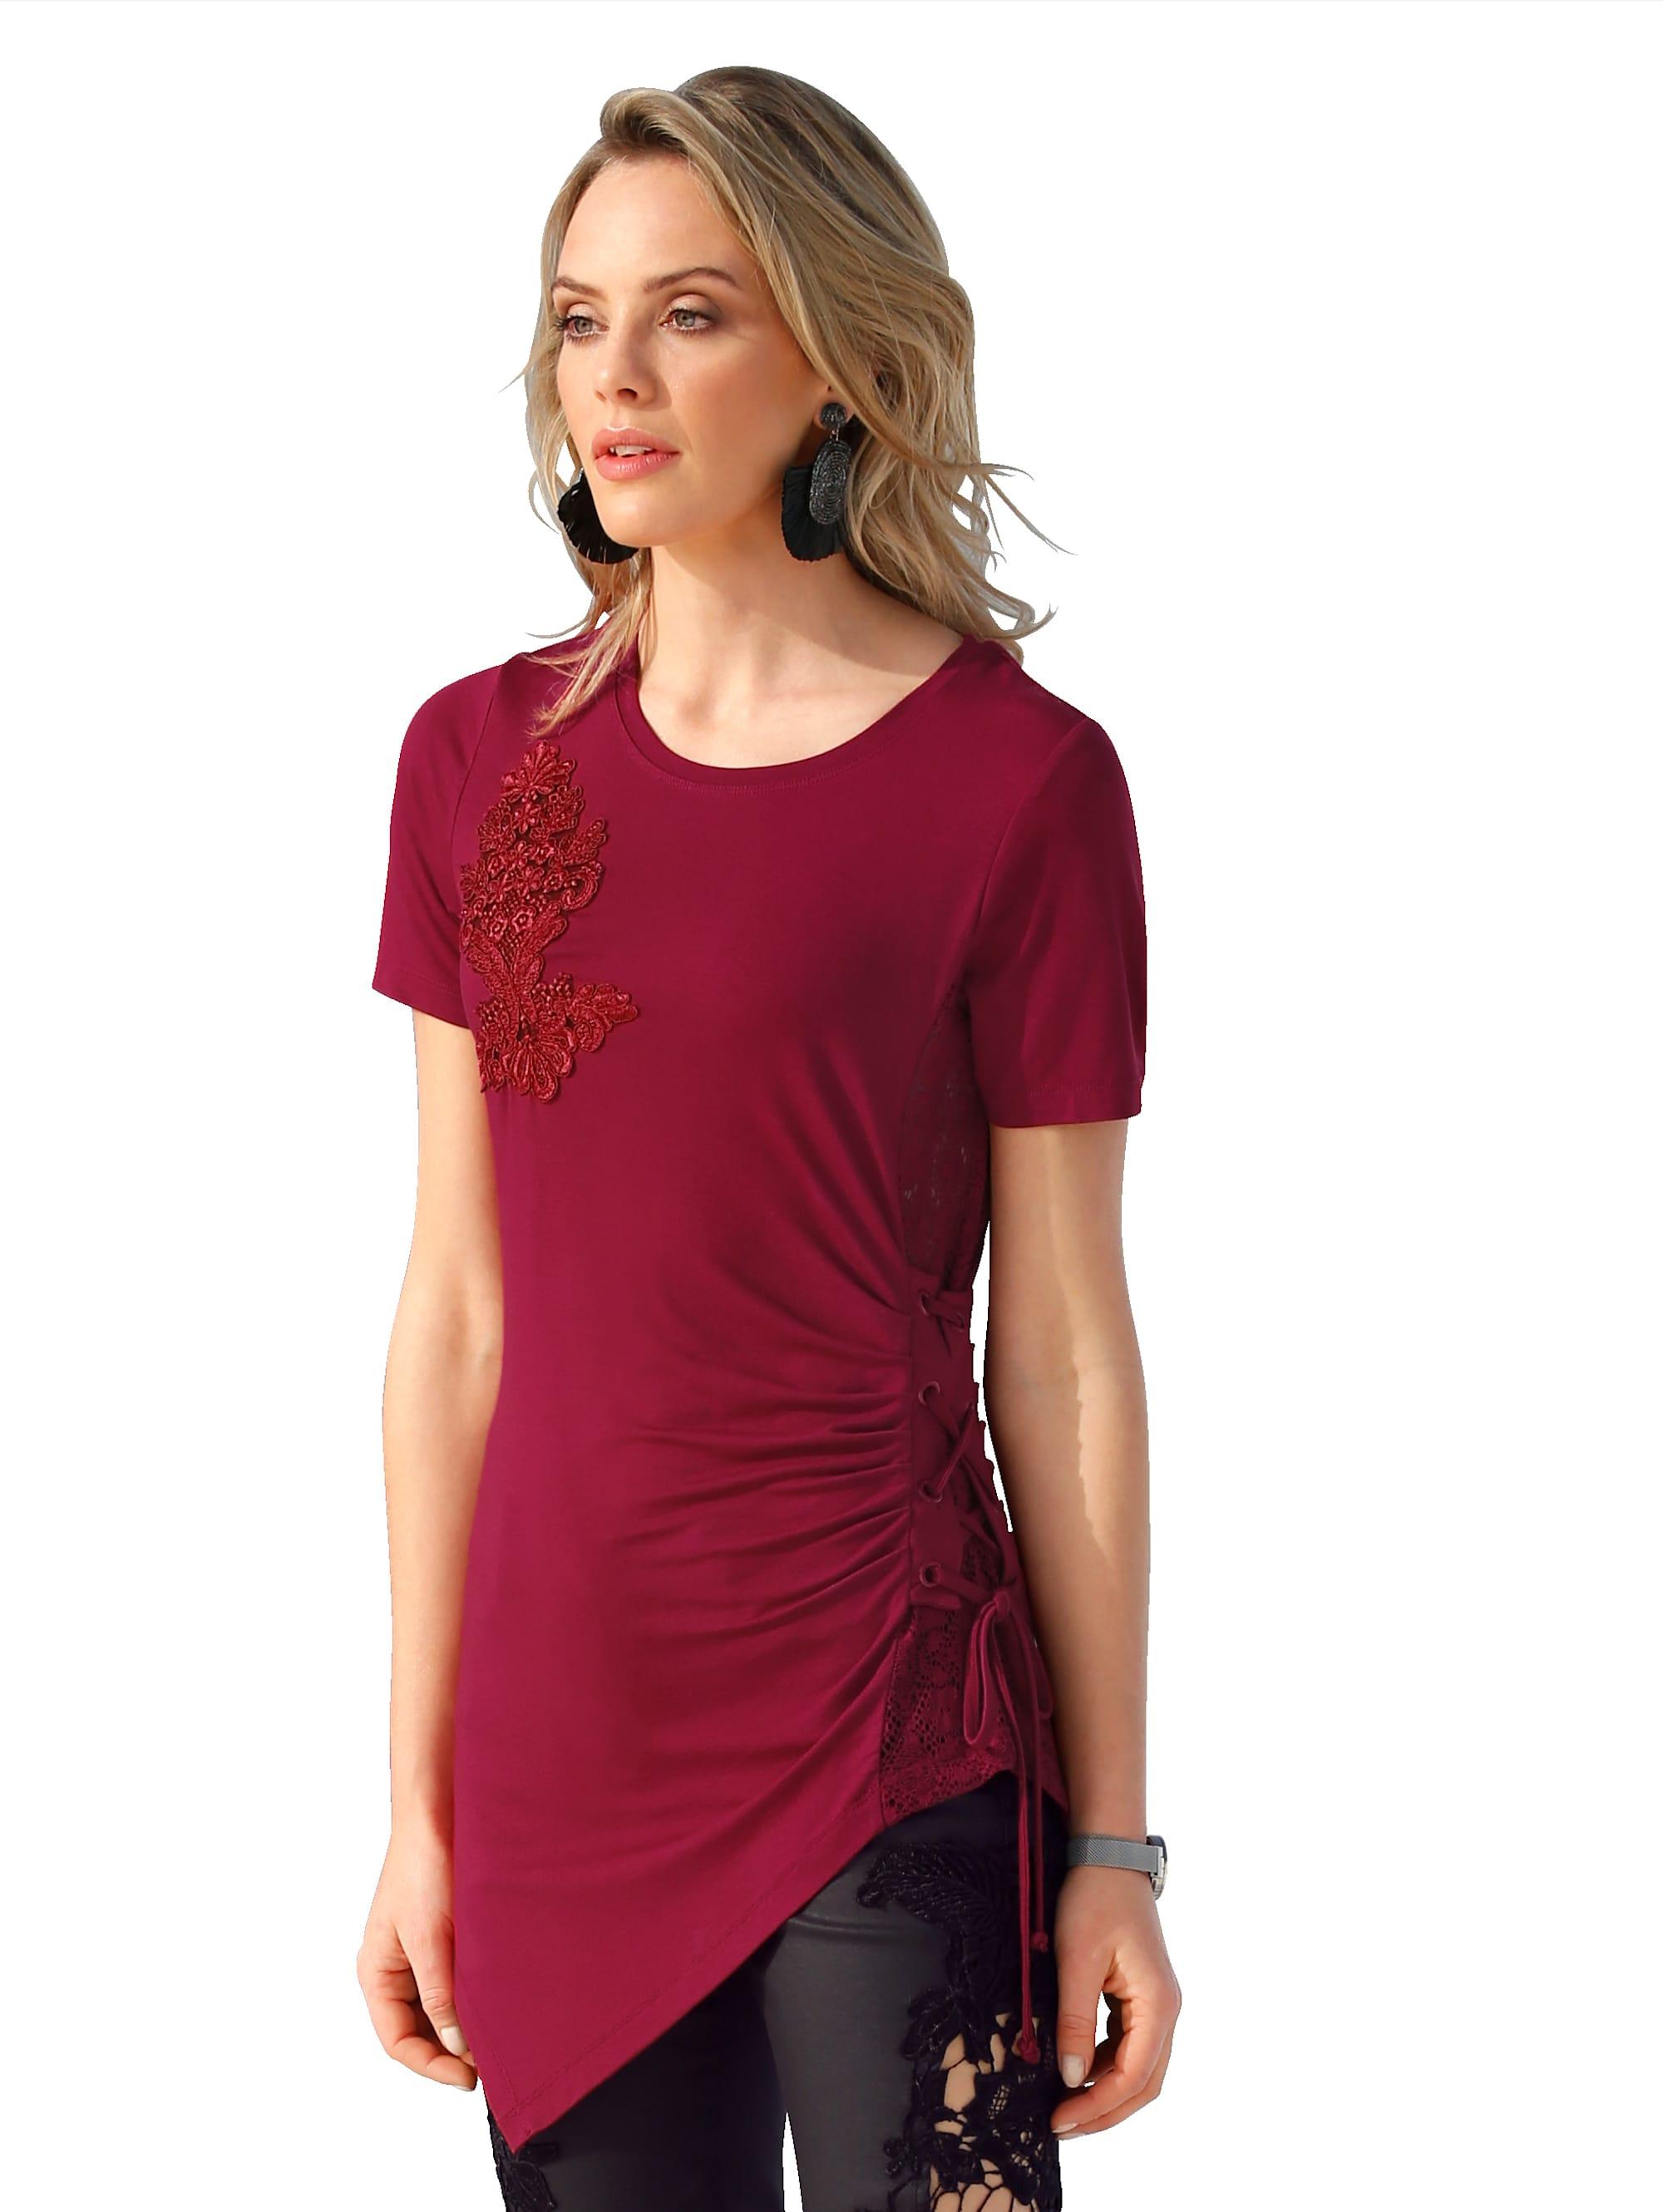 AMY VERMONT Shirt mit transparentem Spitzeneinsatz hk0Ij Iz5KX